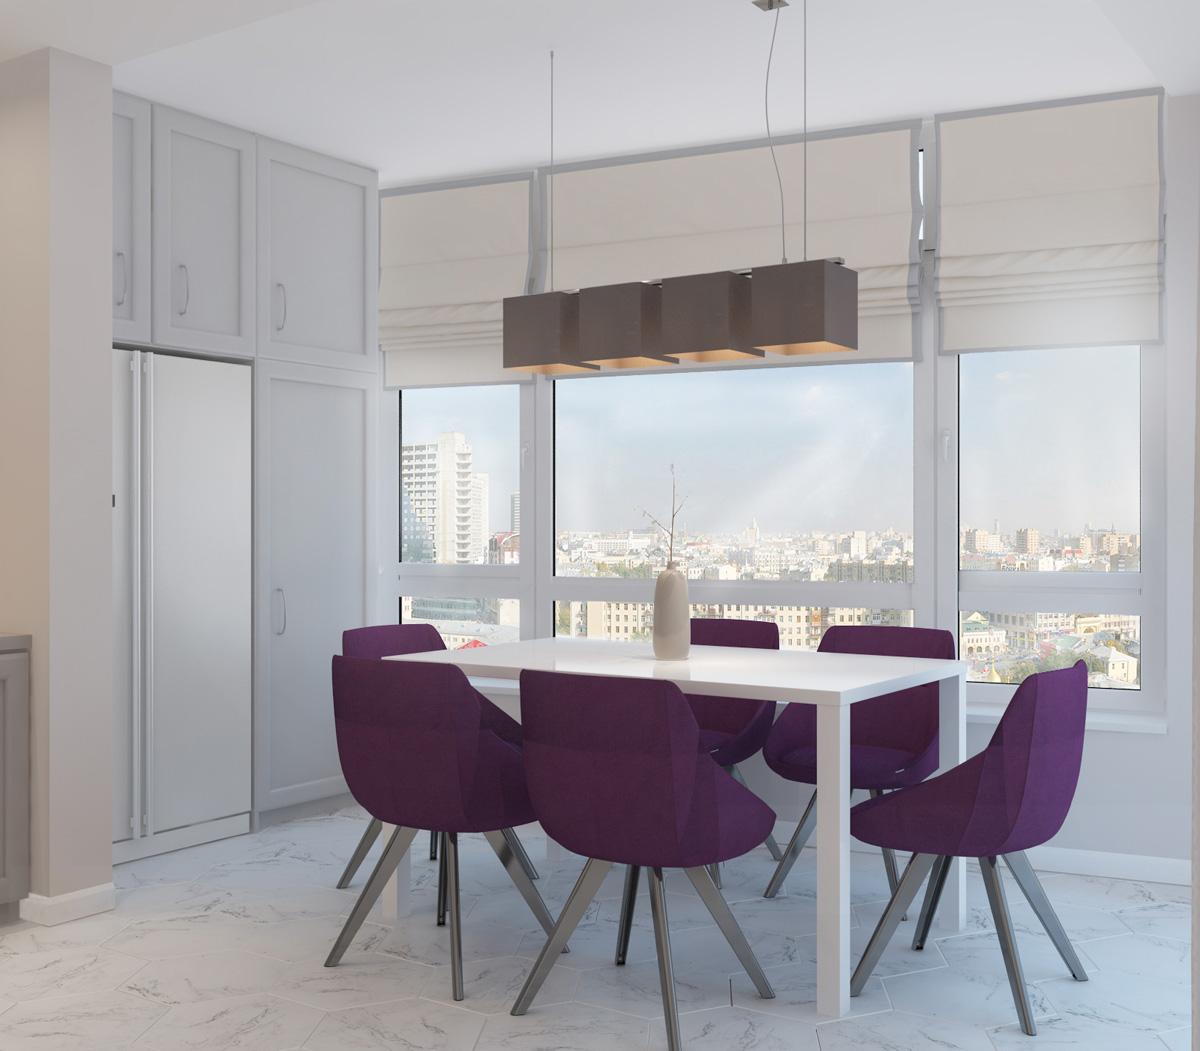 Панорама кухні | дизайн-проект ЖК «Олімпійський»